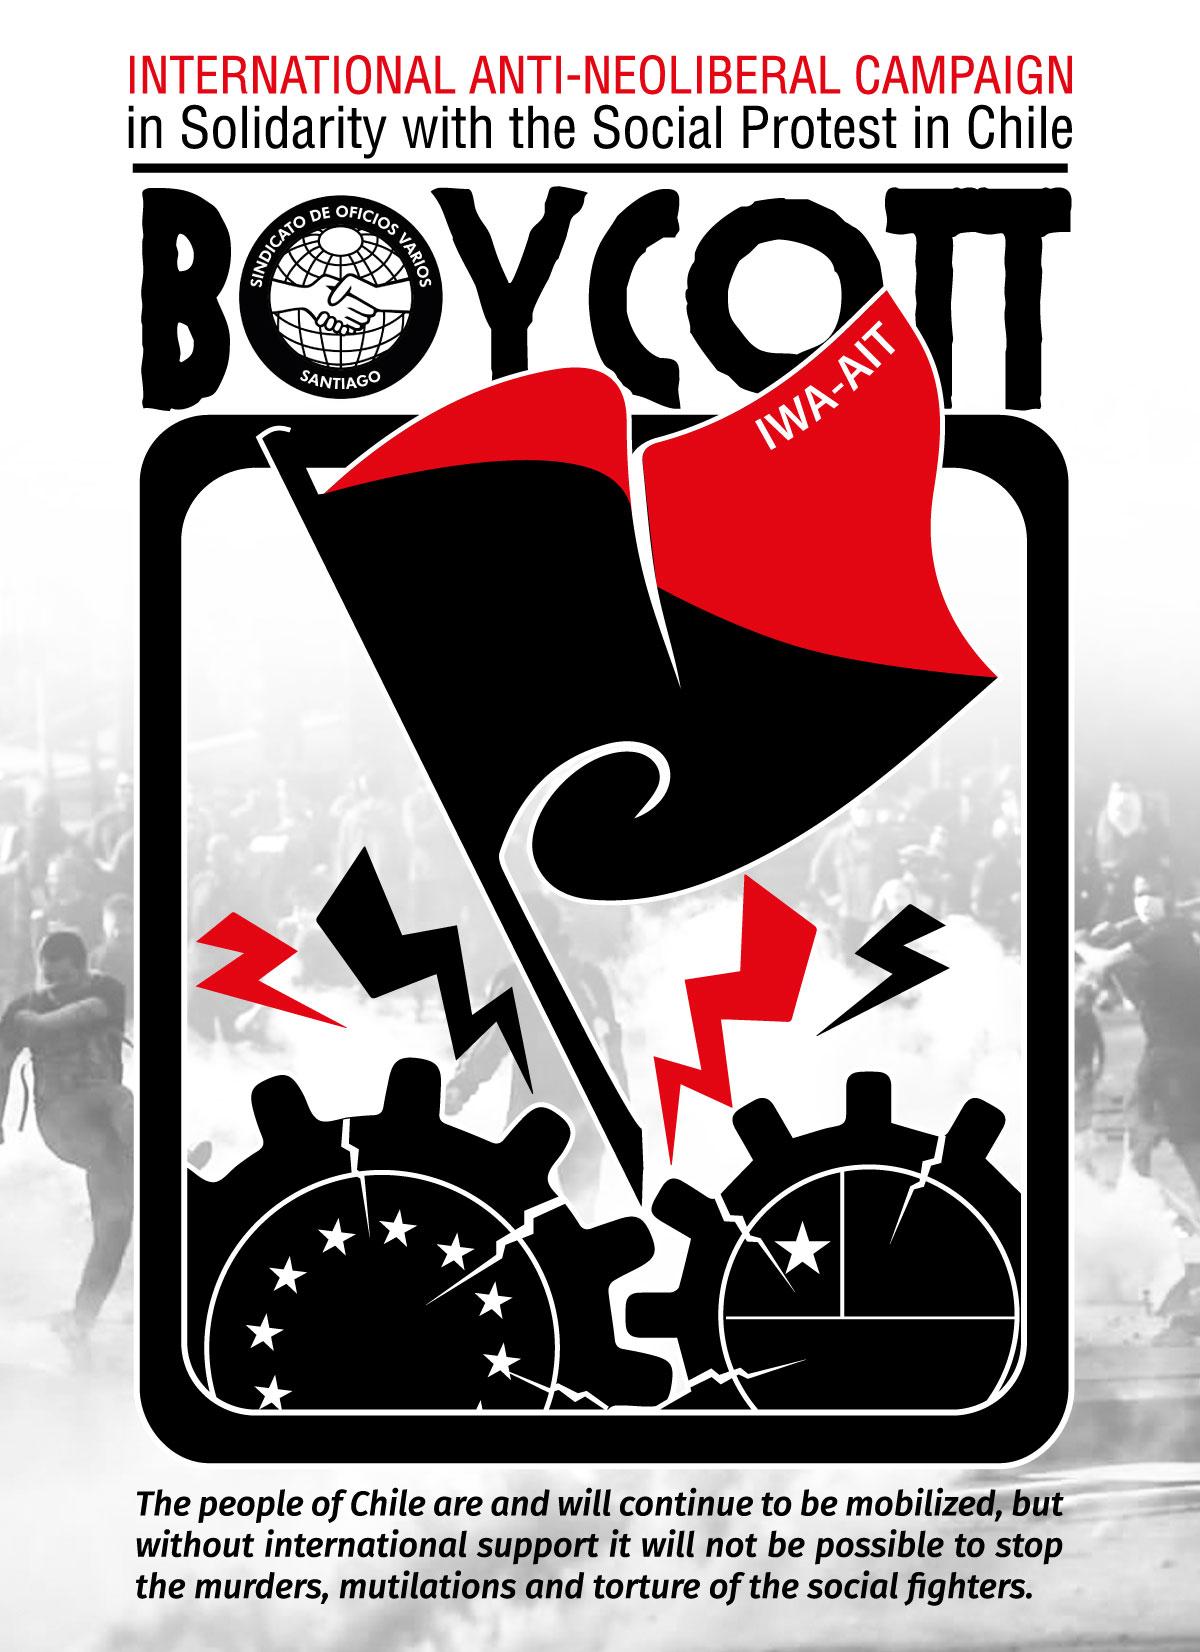 Boycott Chilean Products